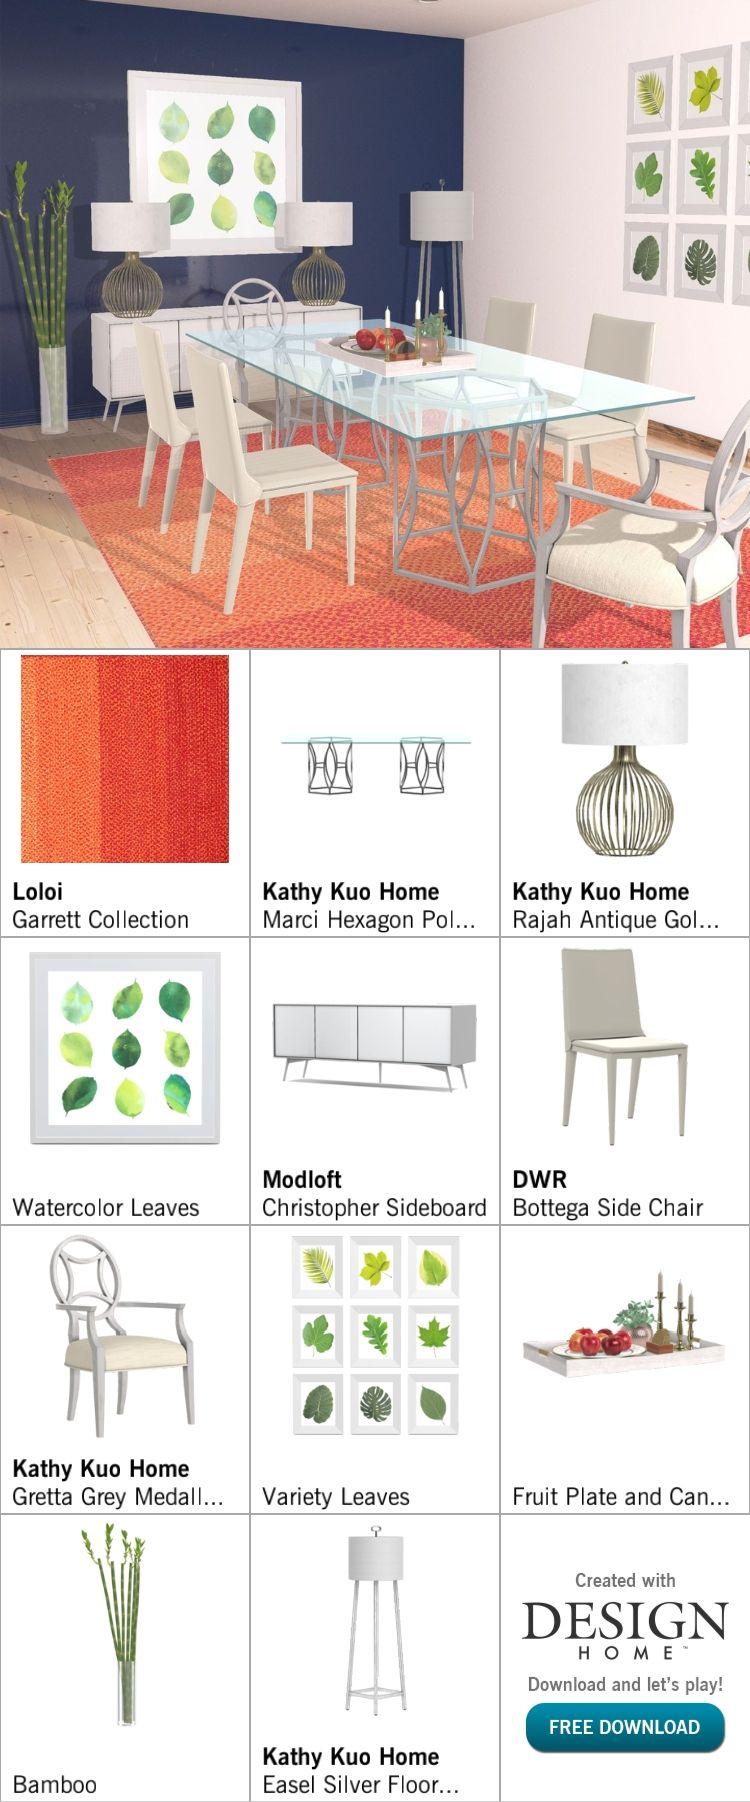 Home interior fruit plates created with design home  e  pinterest